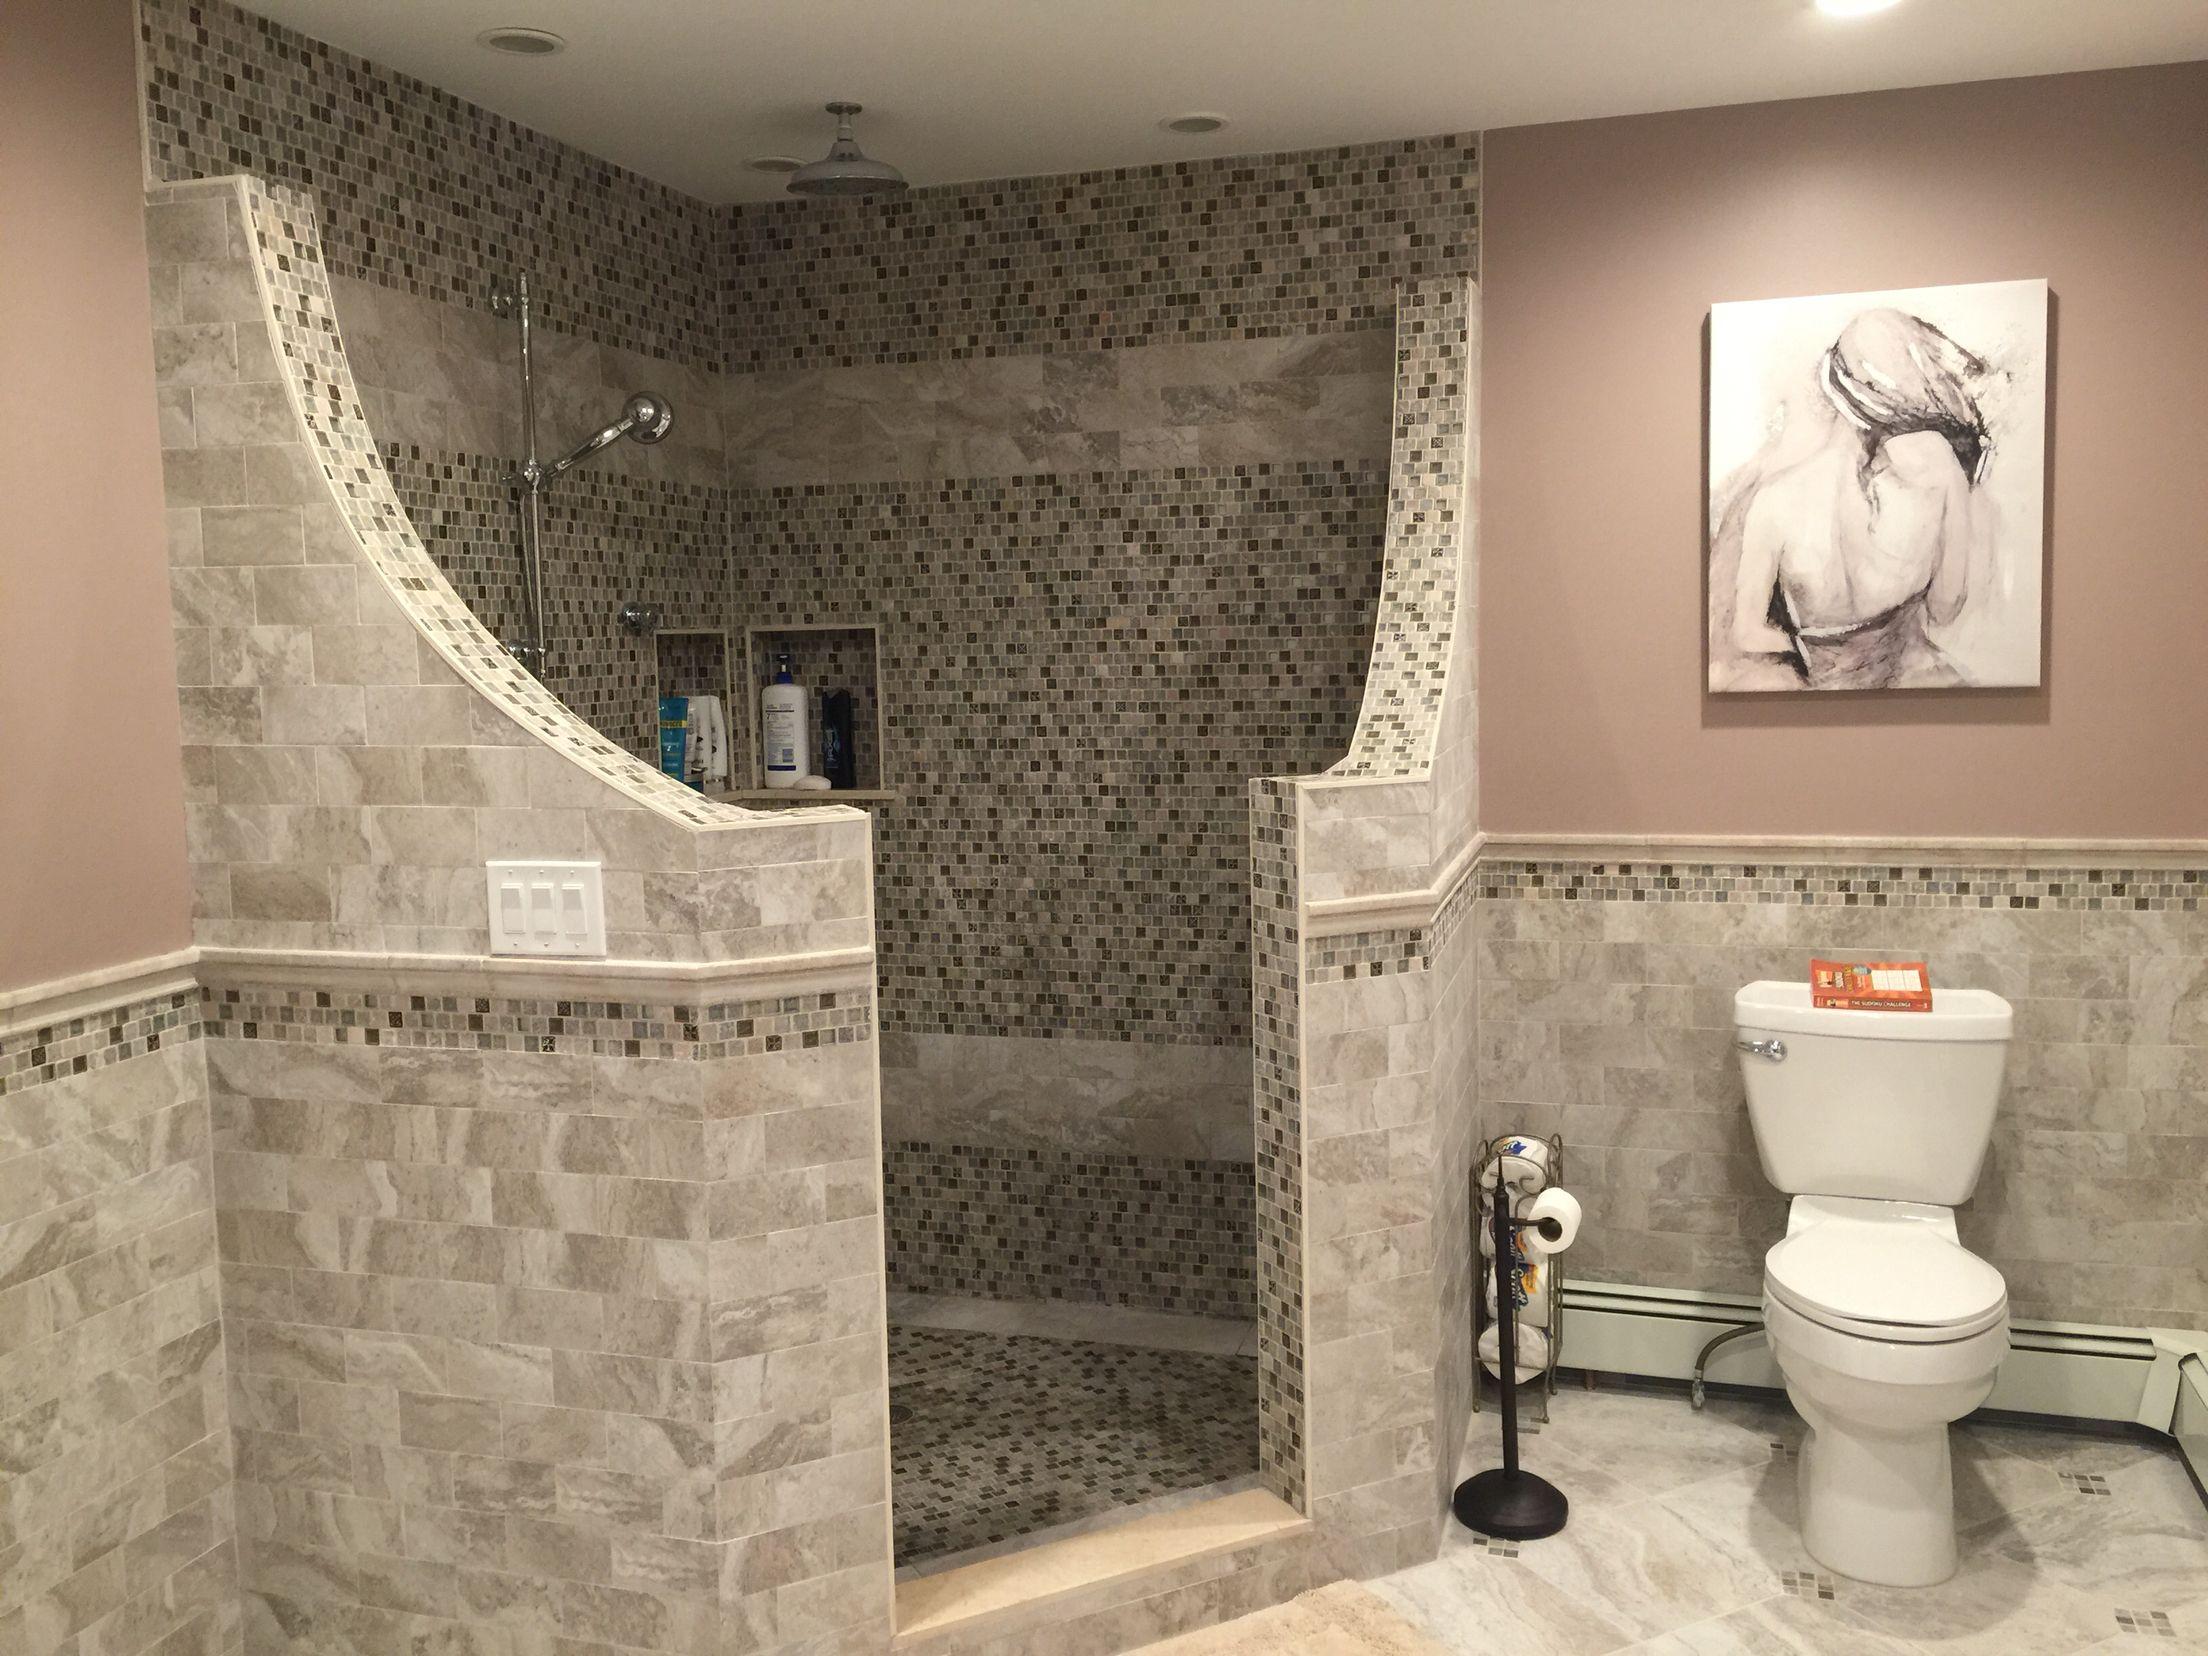 Doorless Shower Bathroom Remodel Shower Shower Remodel Bathrooms Remodel